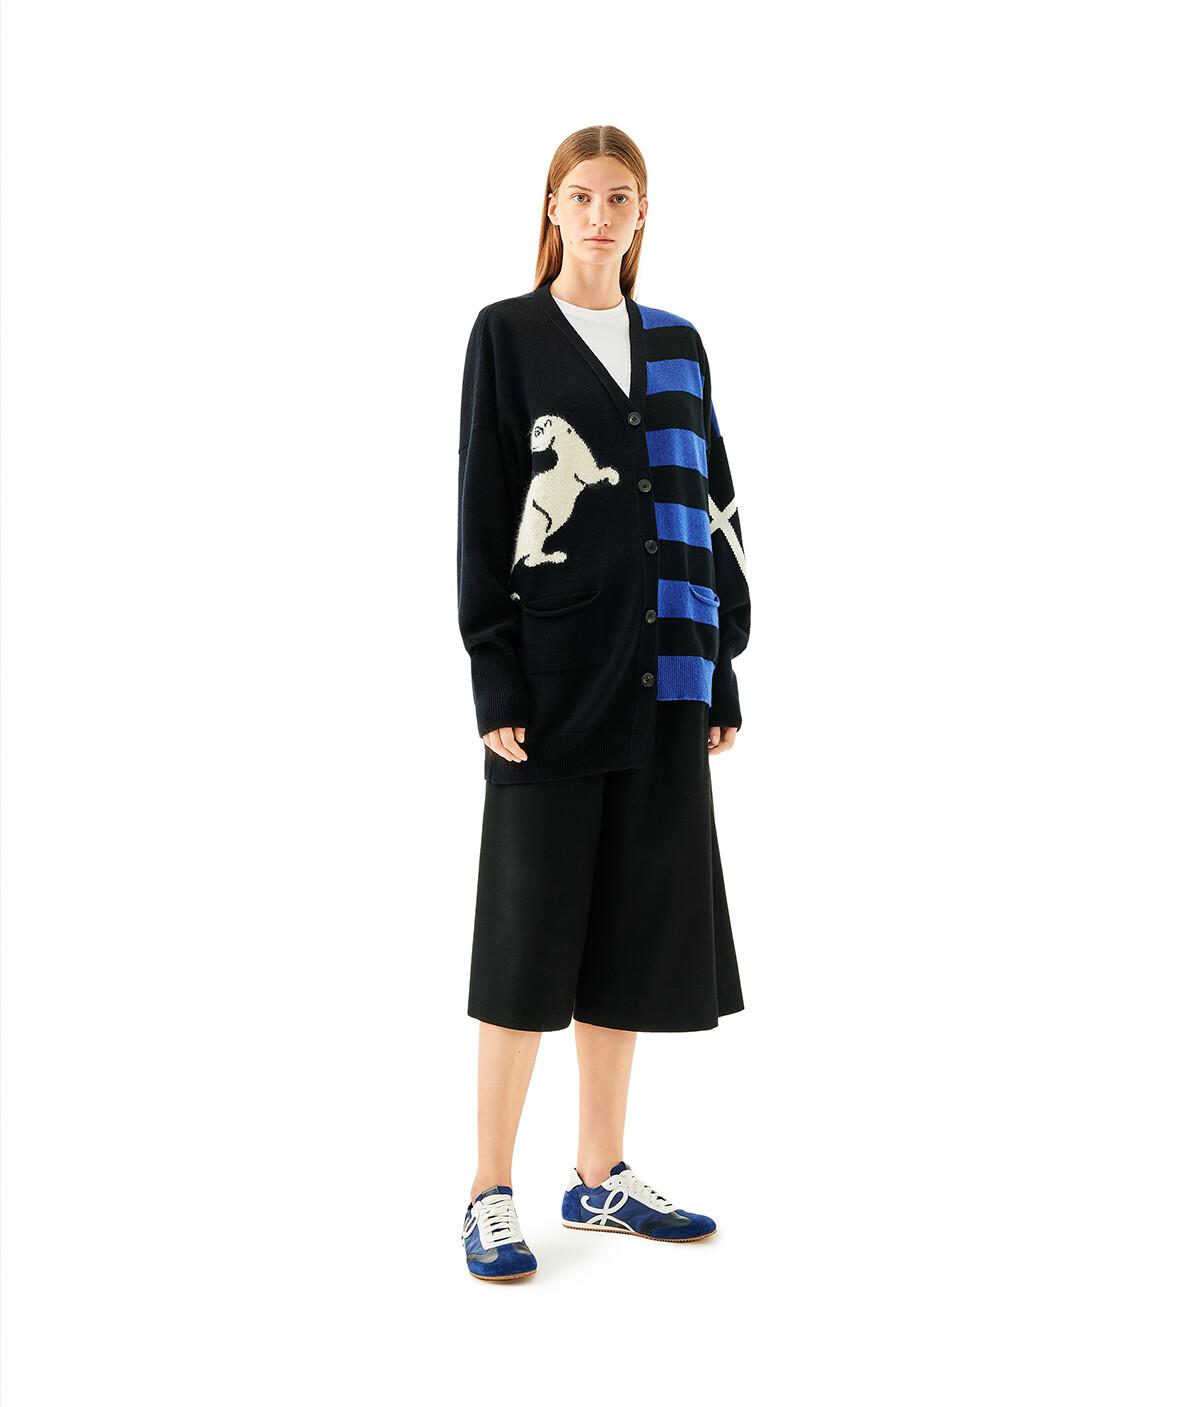 LOEWE Asymmetric Cardigan Animals Black/Royal Blue front